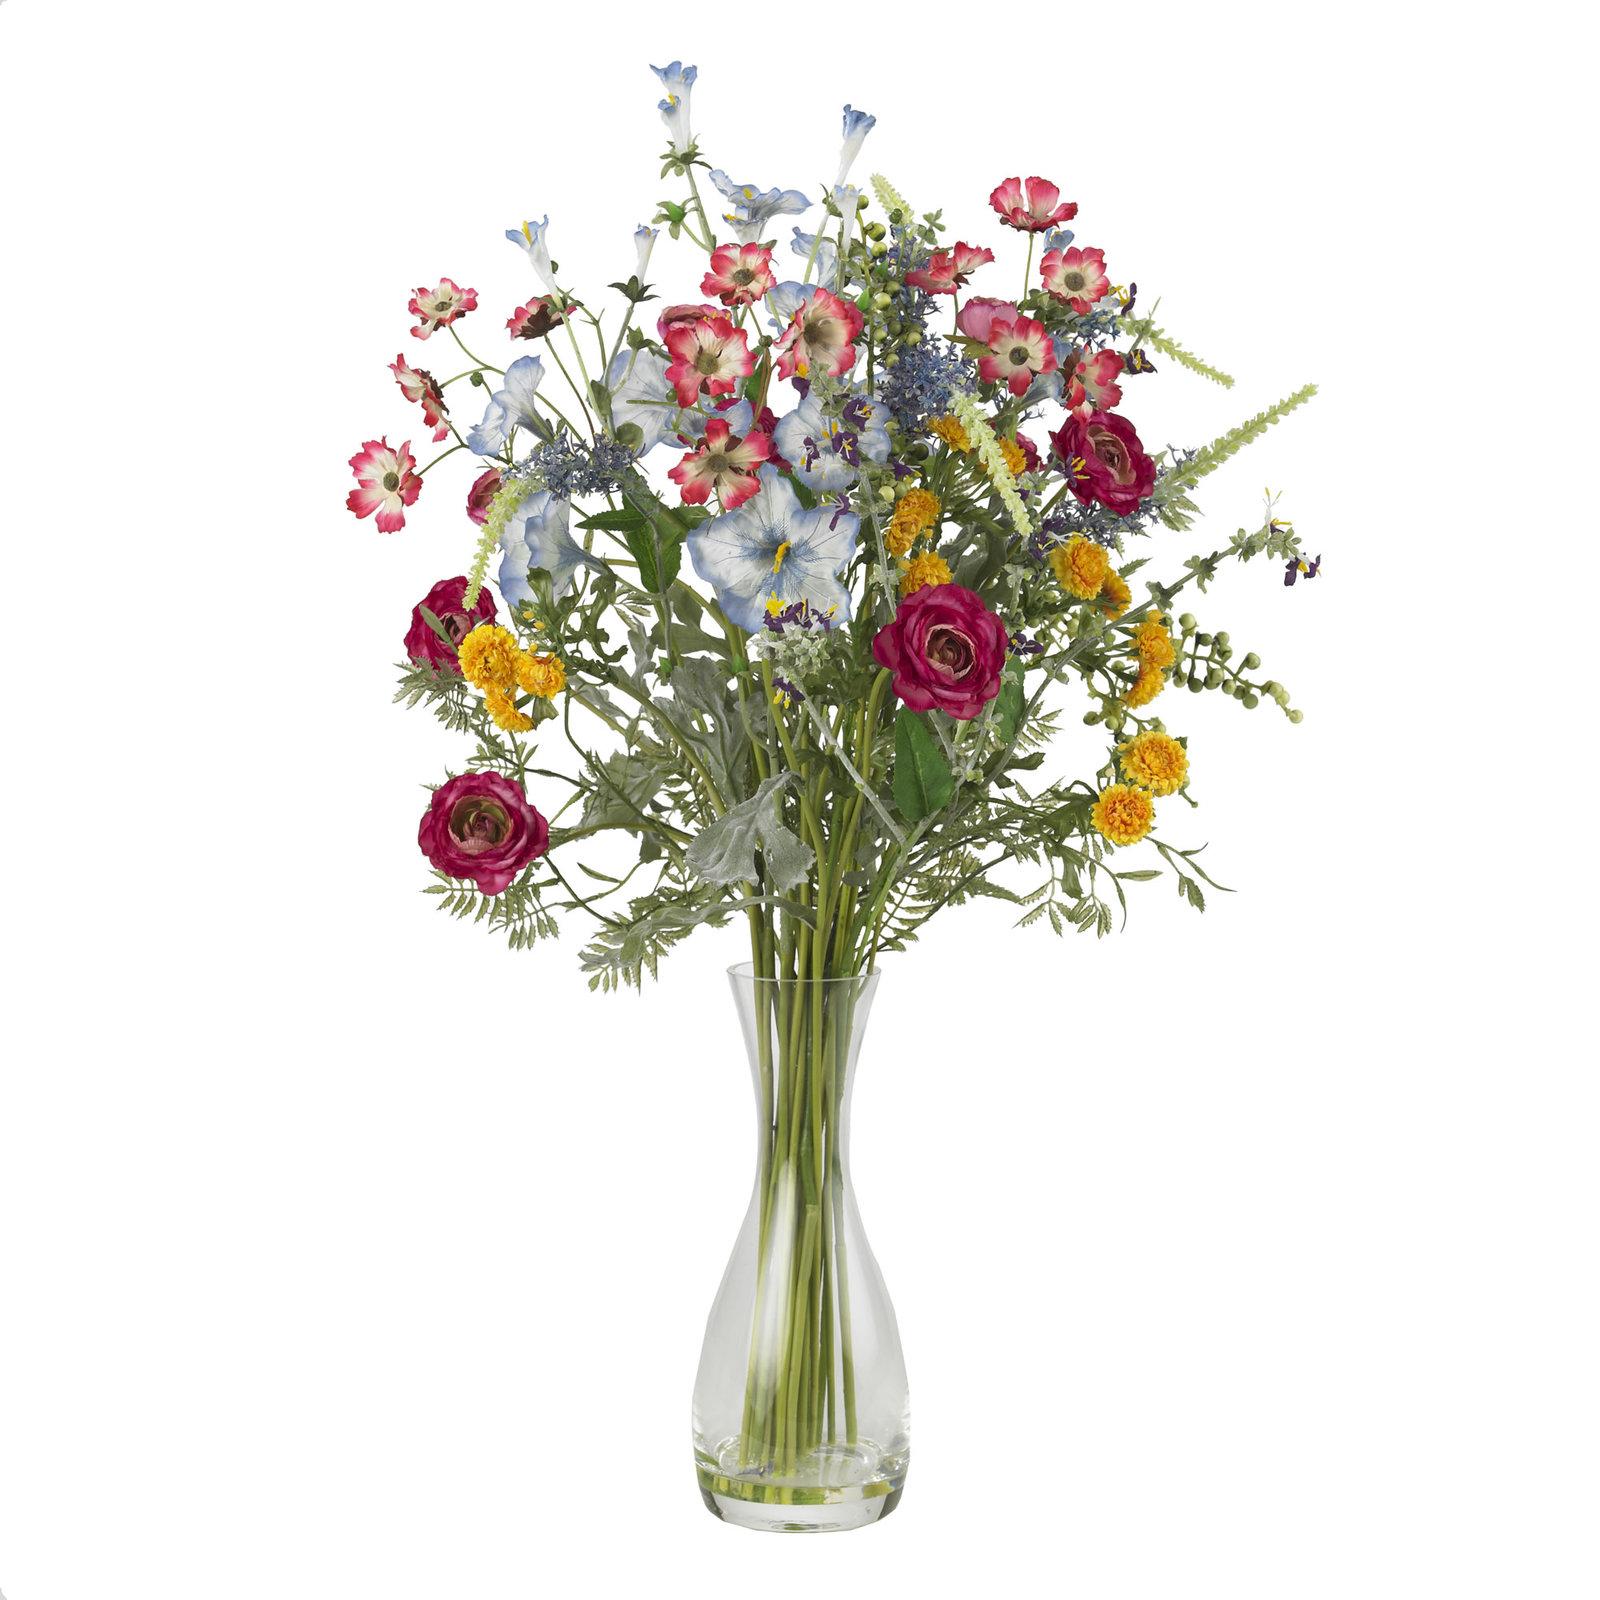 Veranda Garden Silk Flower Arrangement - $104.56